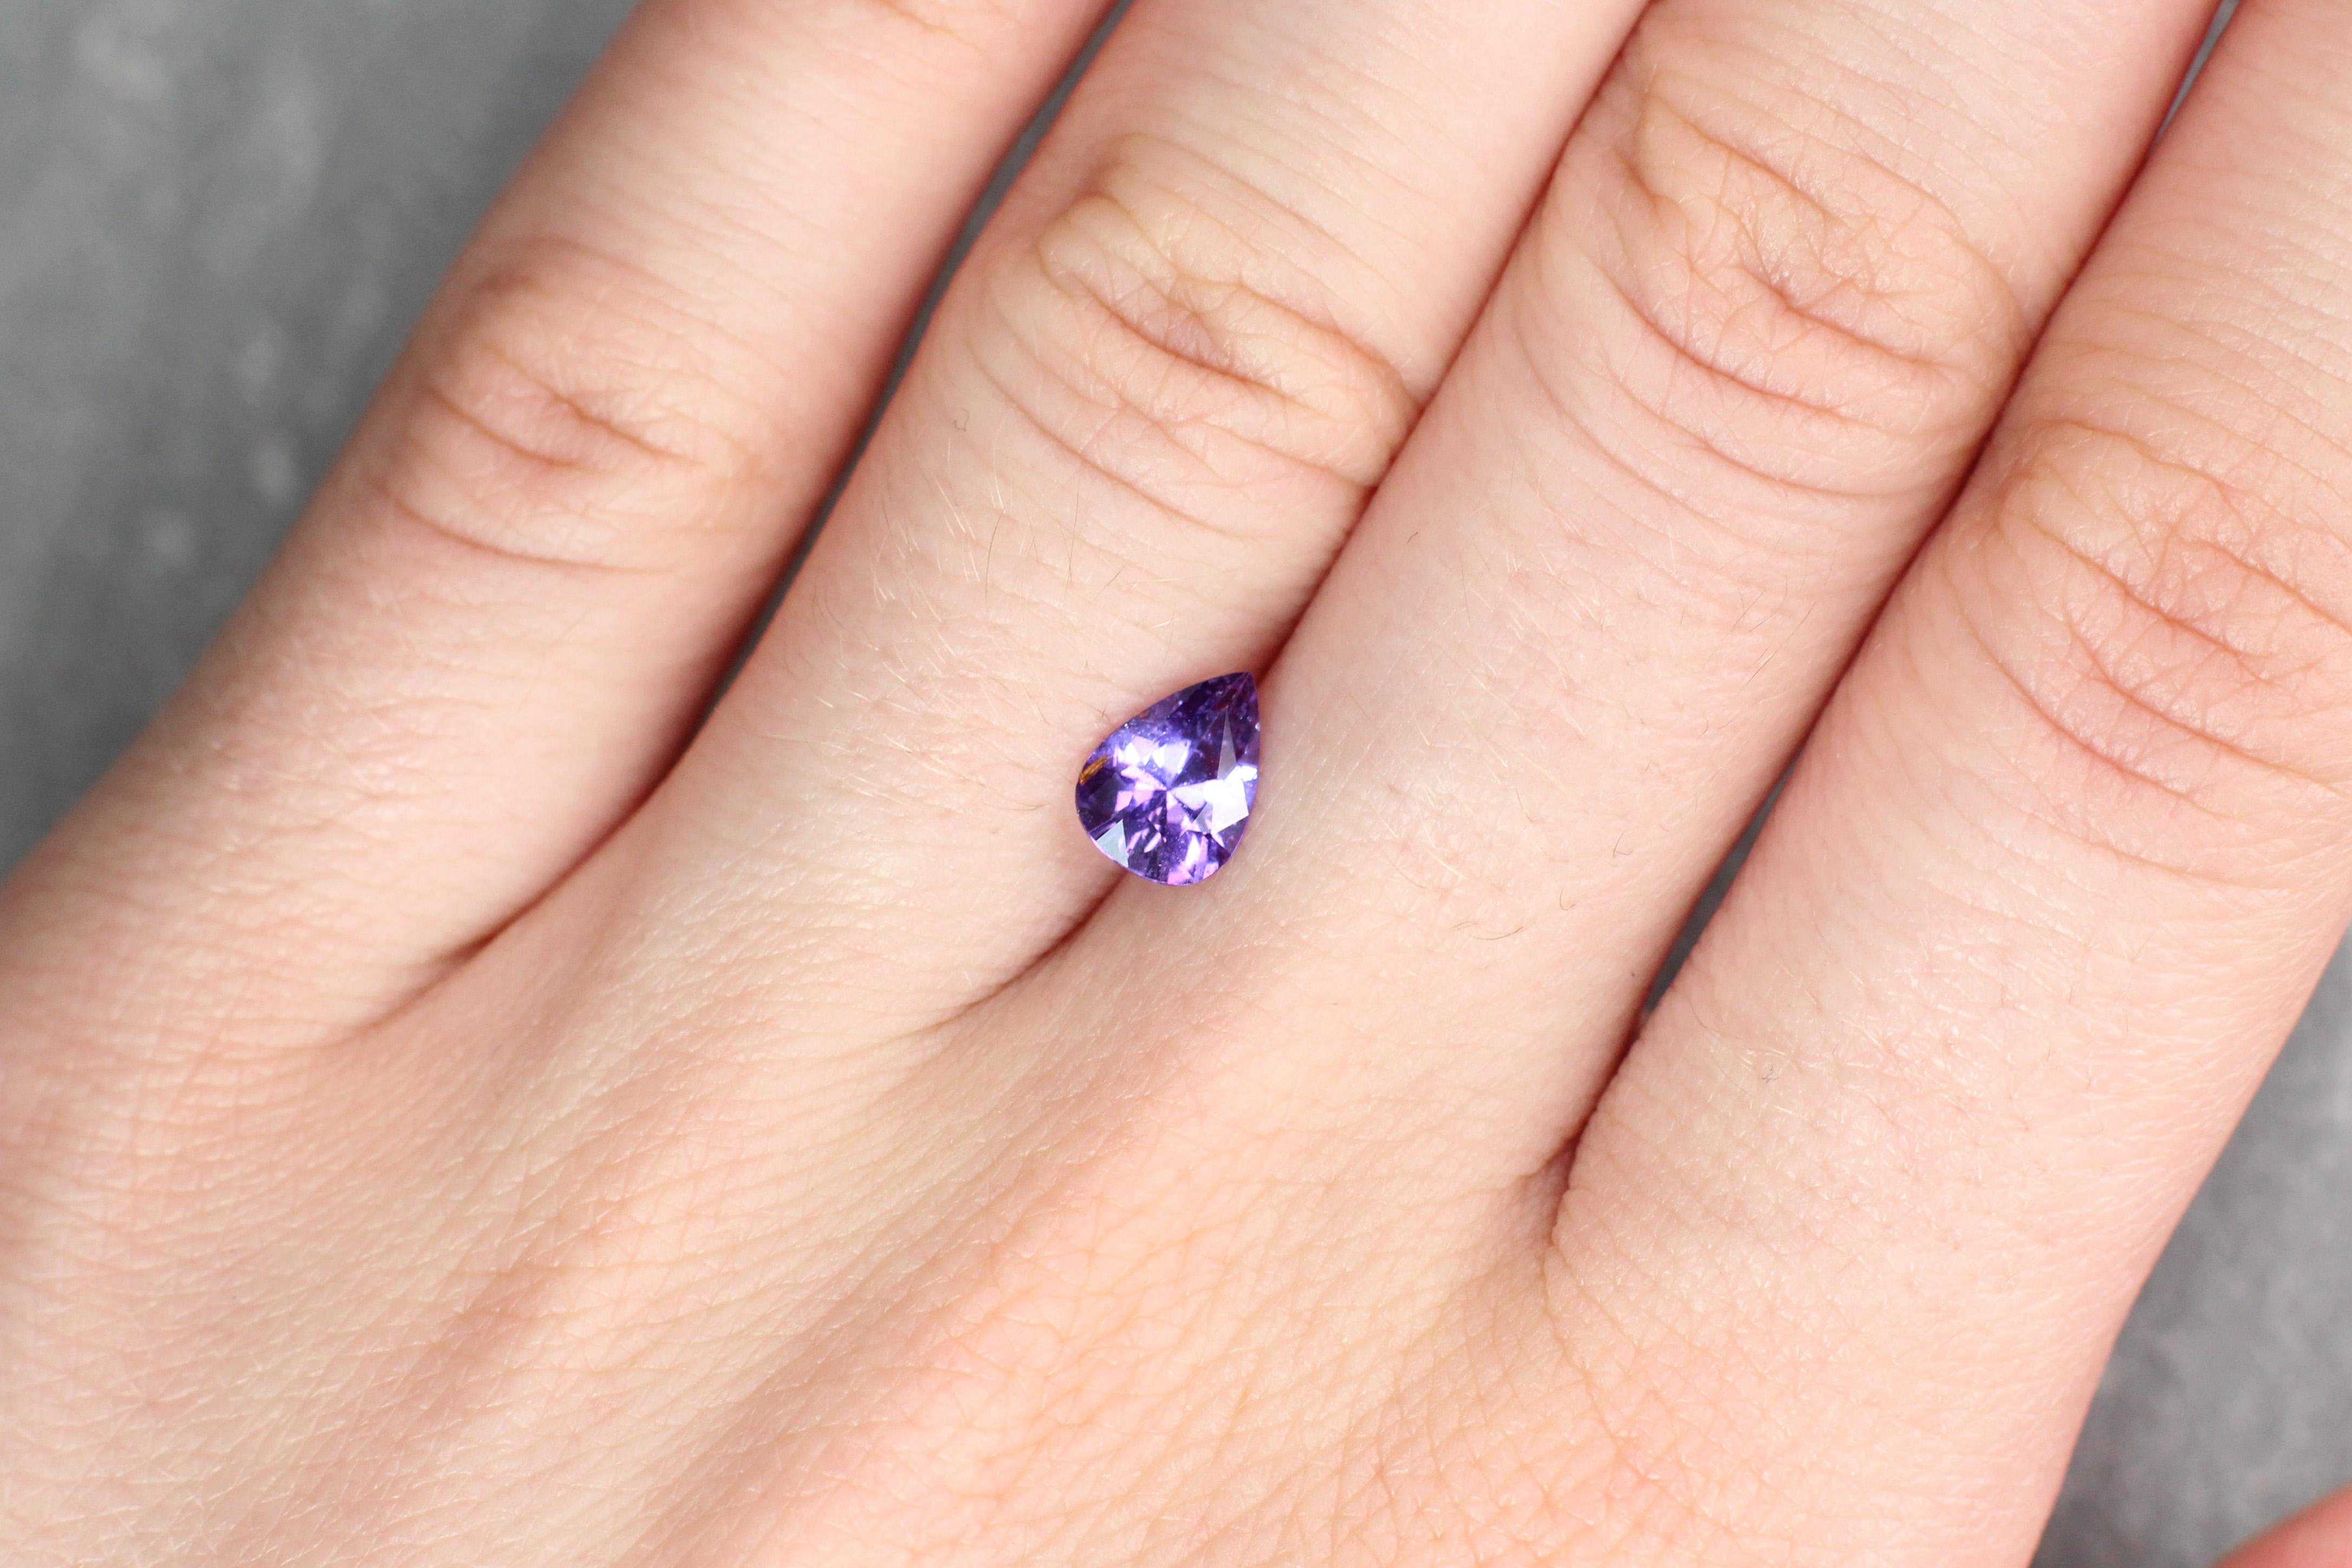 0.99 ct purple pear shape sapphire